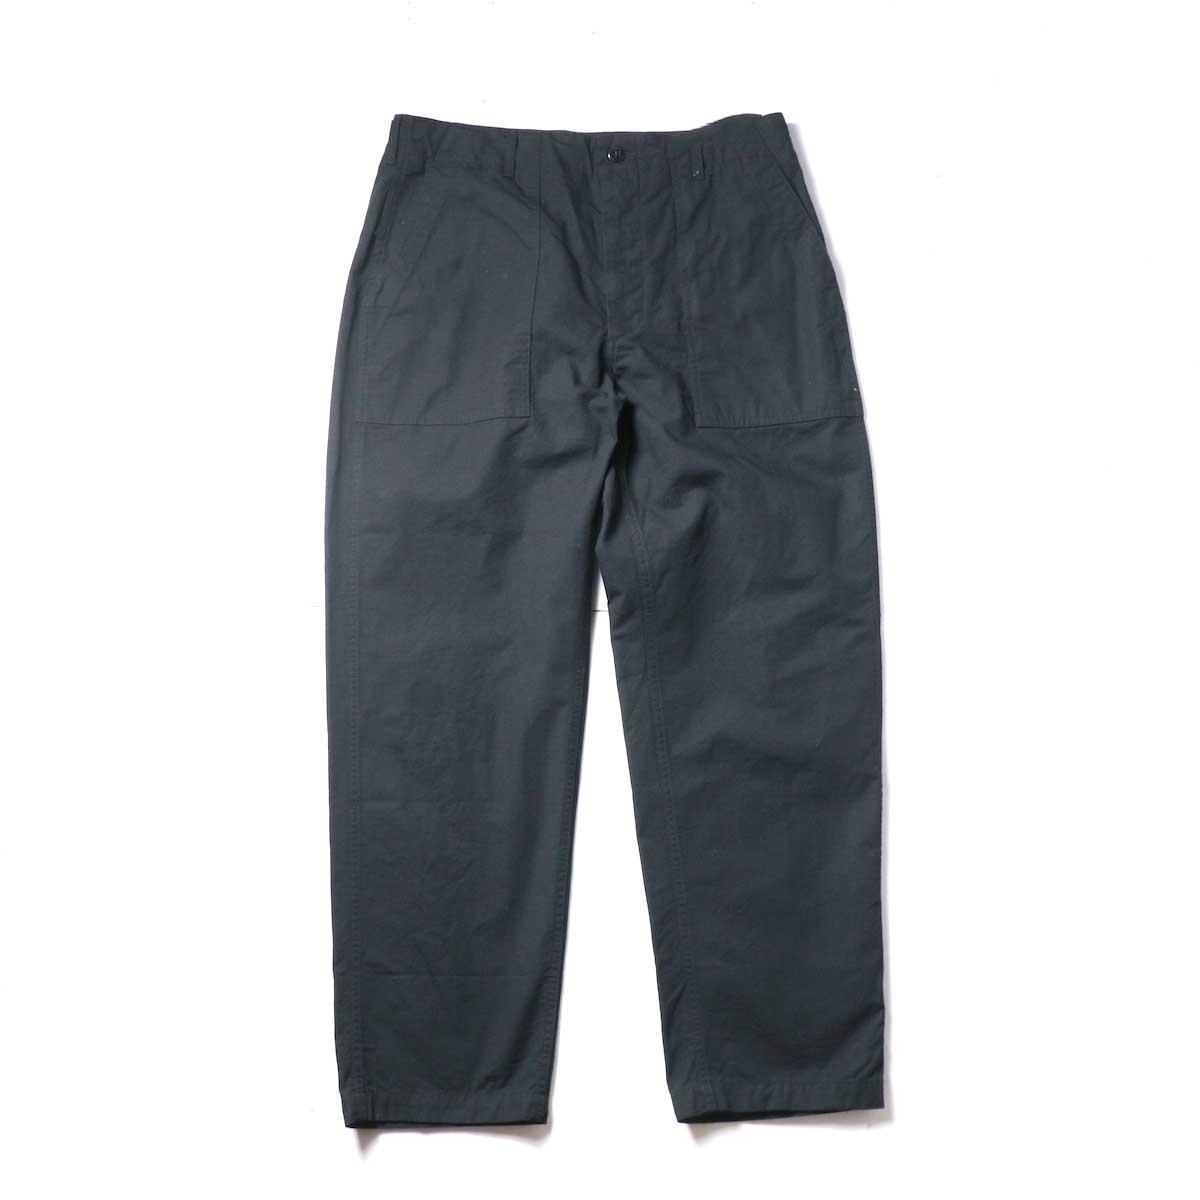 Engineered Garments / Fatigue Pant - Cotton Ripstop (Black)